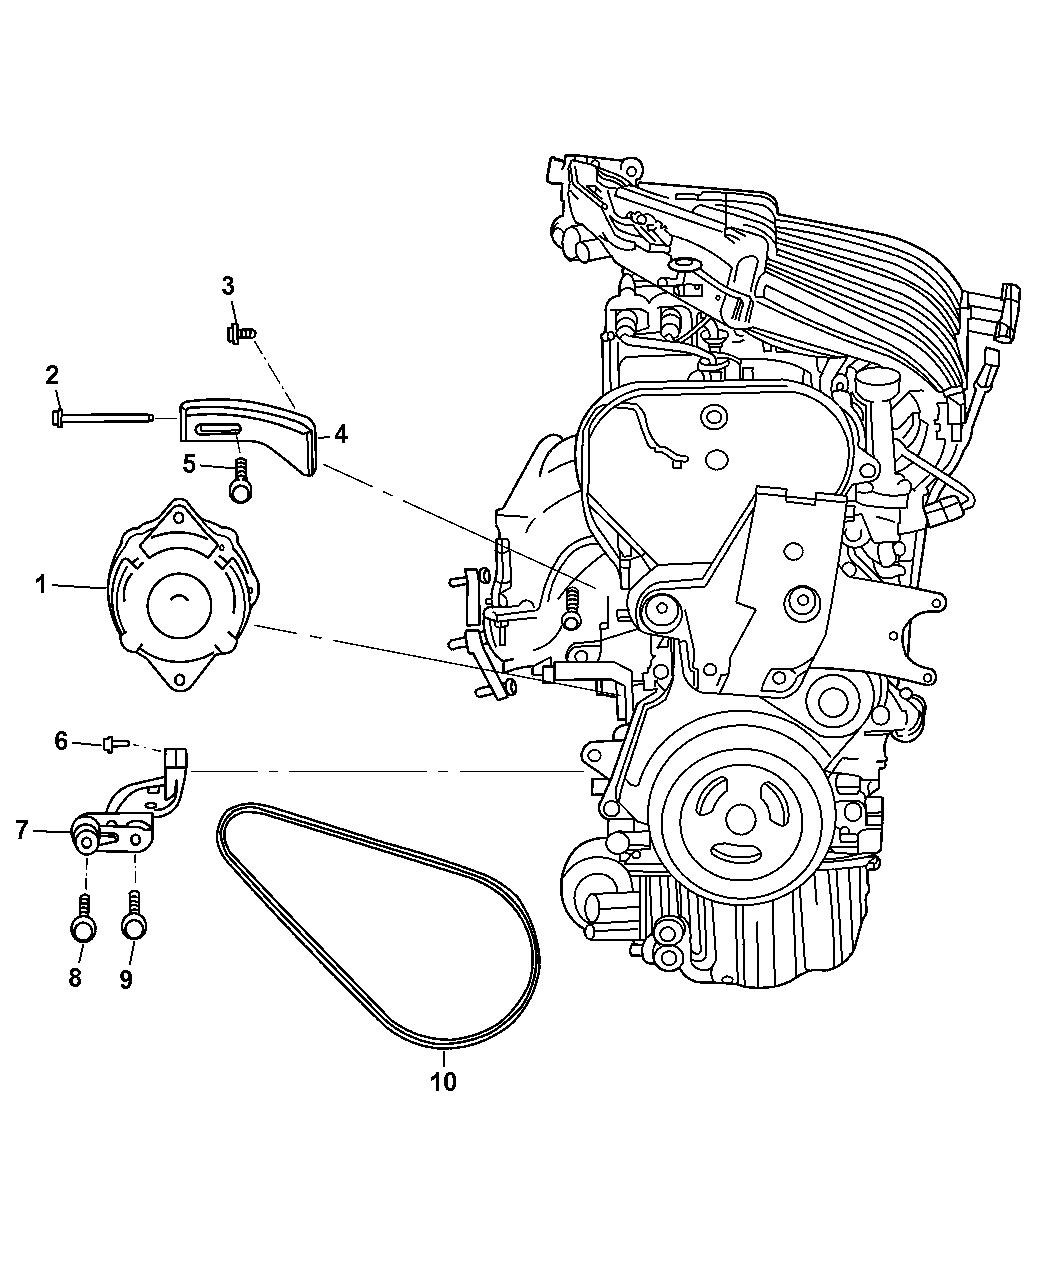 4668446AA - Genuine Chrysler BRACKET-ALTERNATOR ADJUSTING